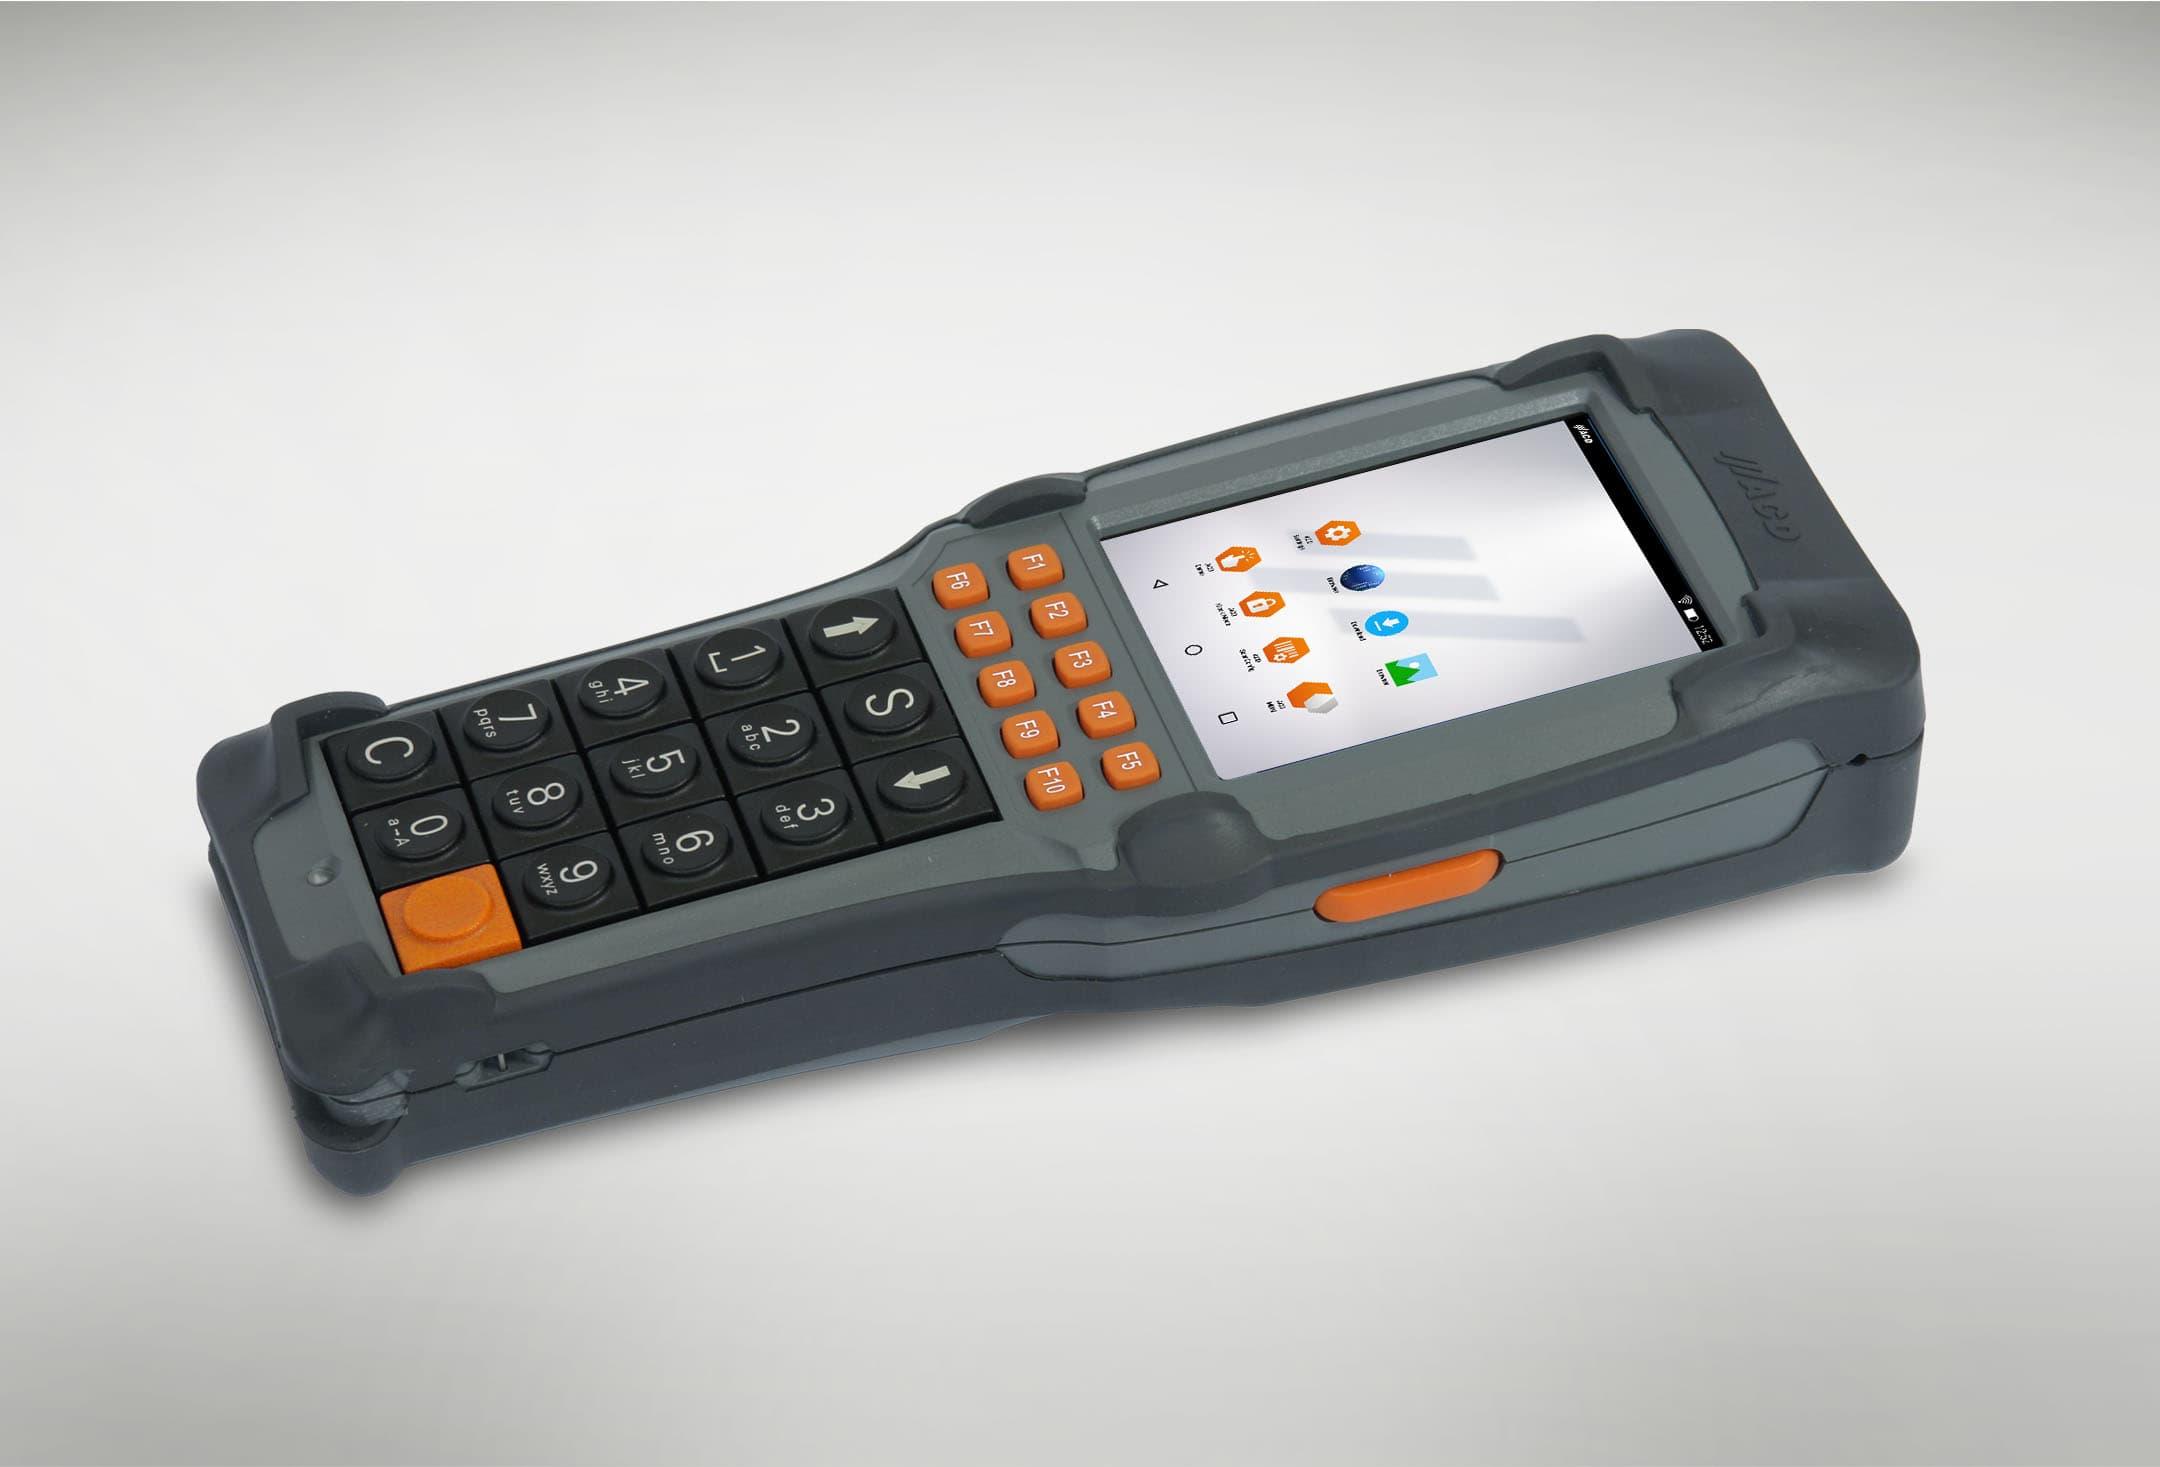 ACD_handheld_data_terminal_m260te_android